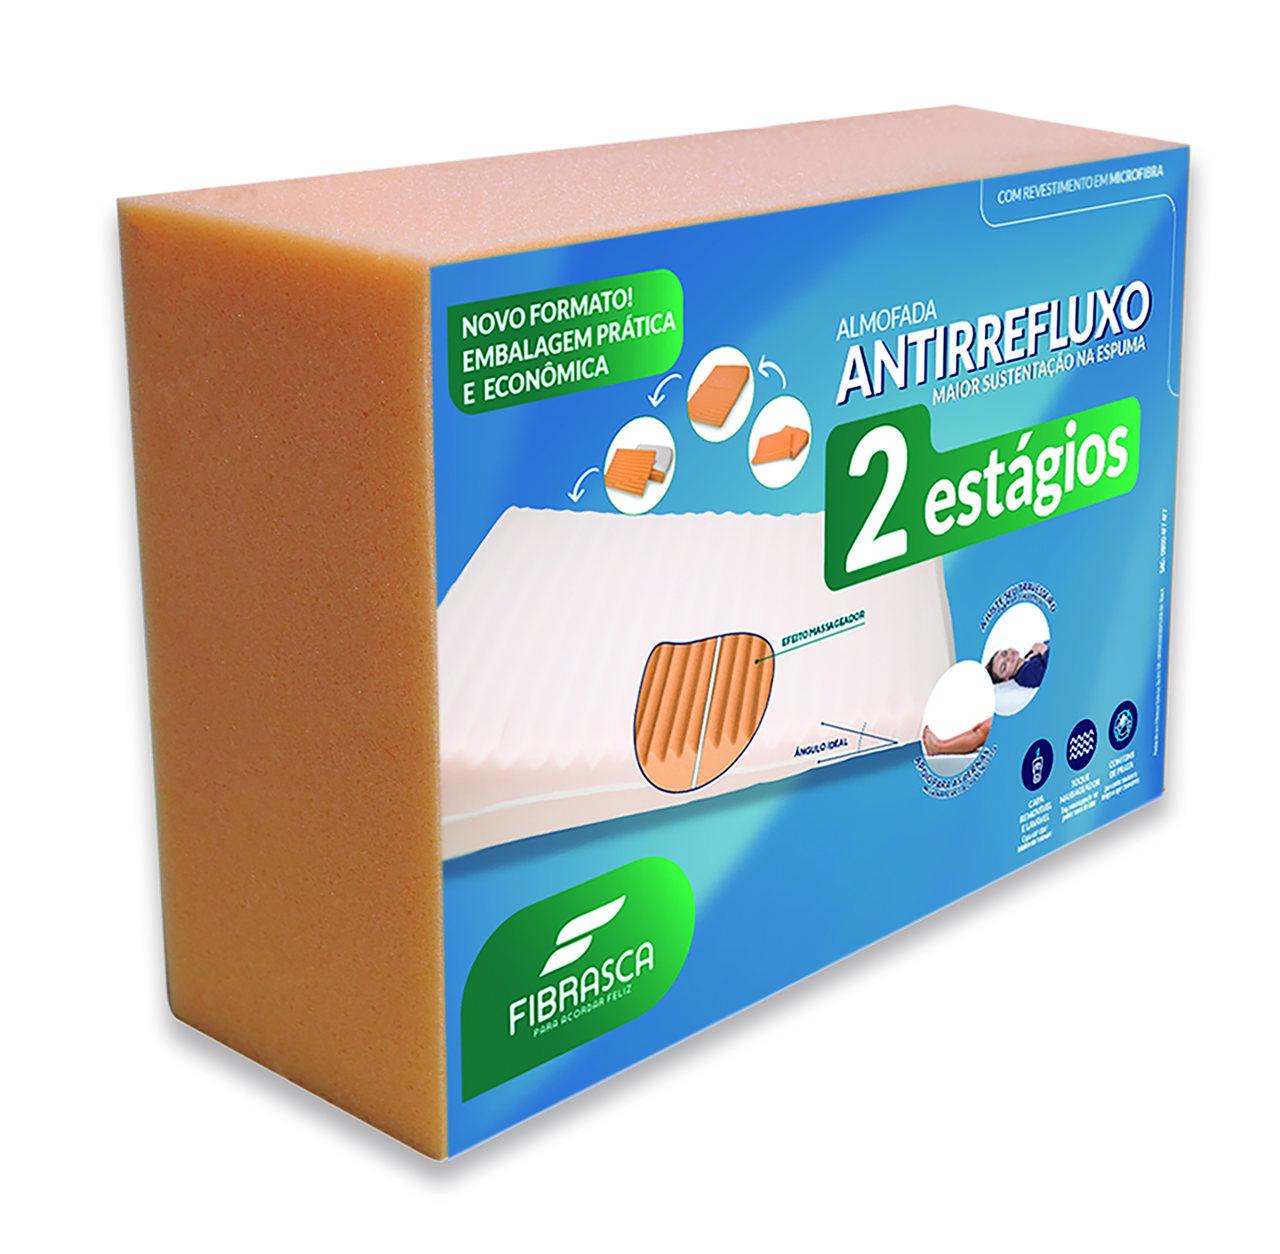 TRAVESSEIRO ANTIRREFLUXO 2 ESTAGIOS - FIBRASCA